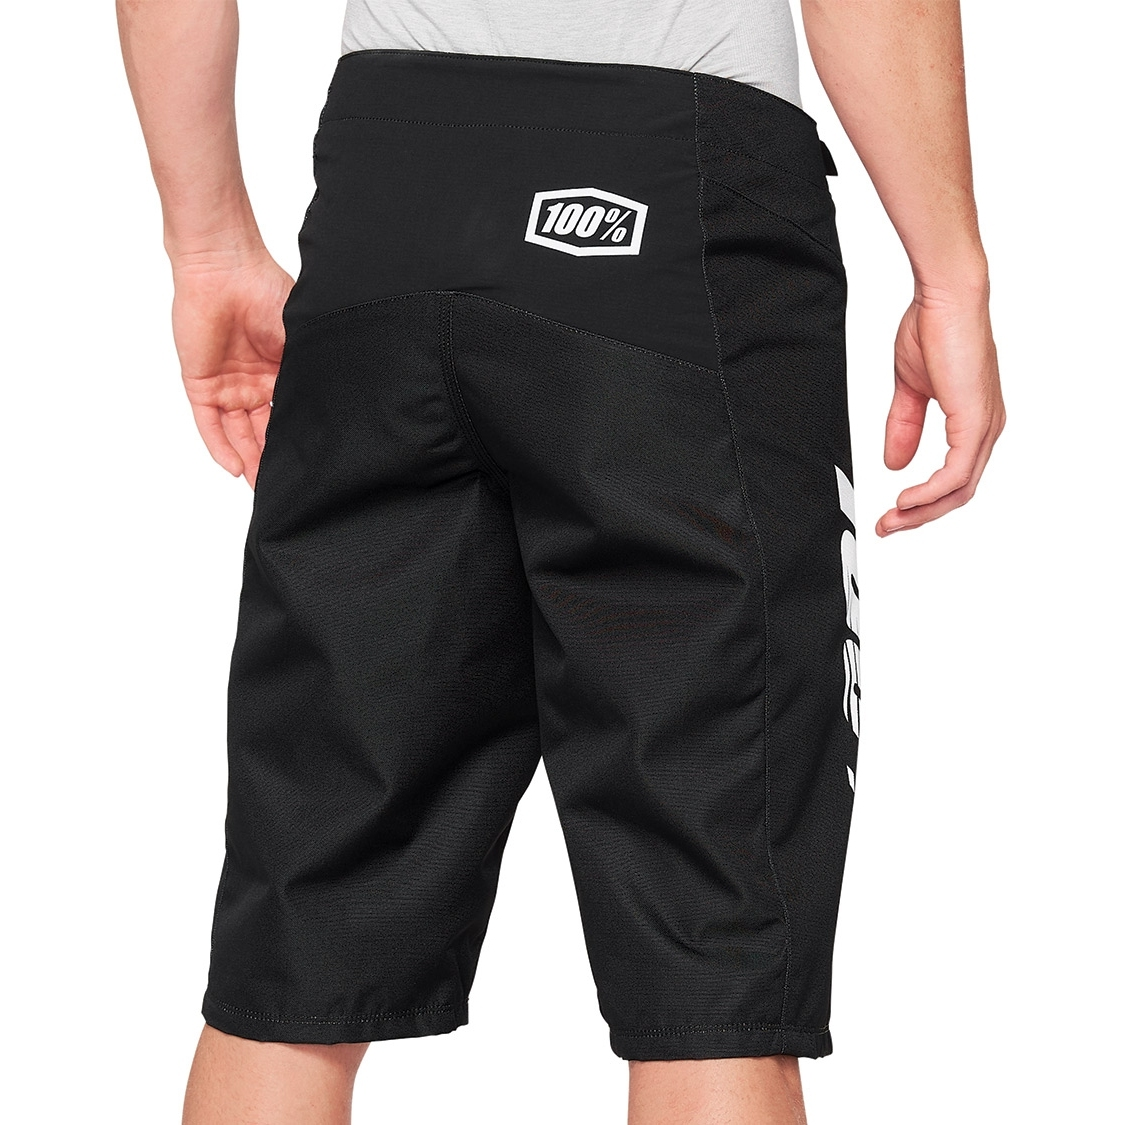 Imagen de 100% R-Core Pantalones - negro